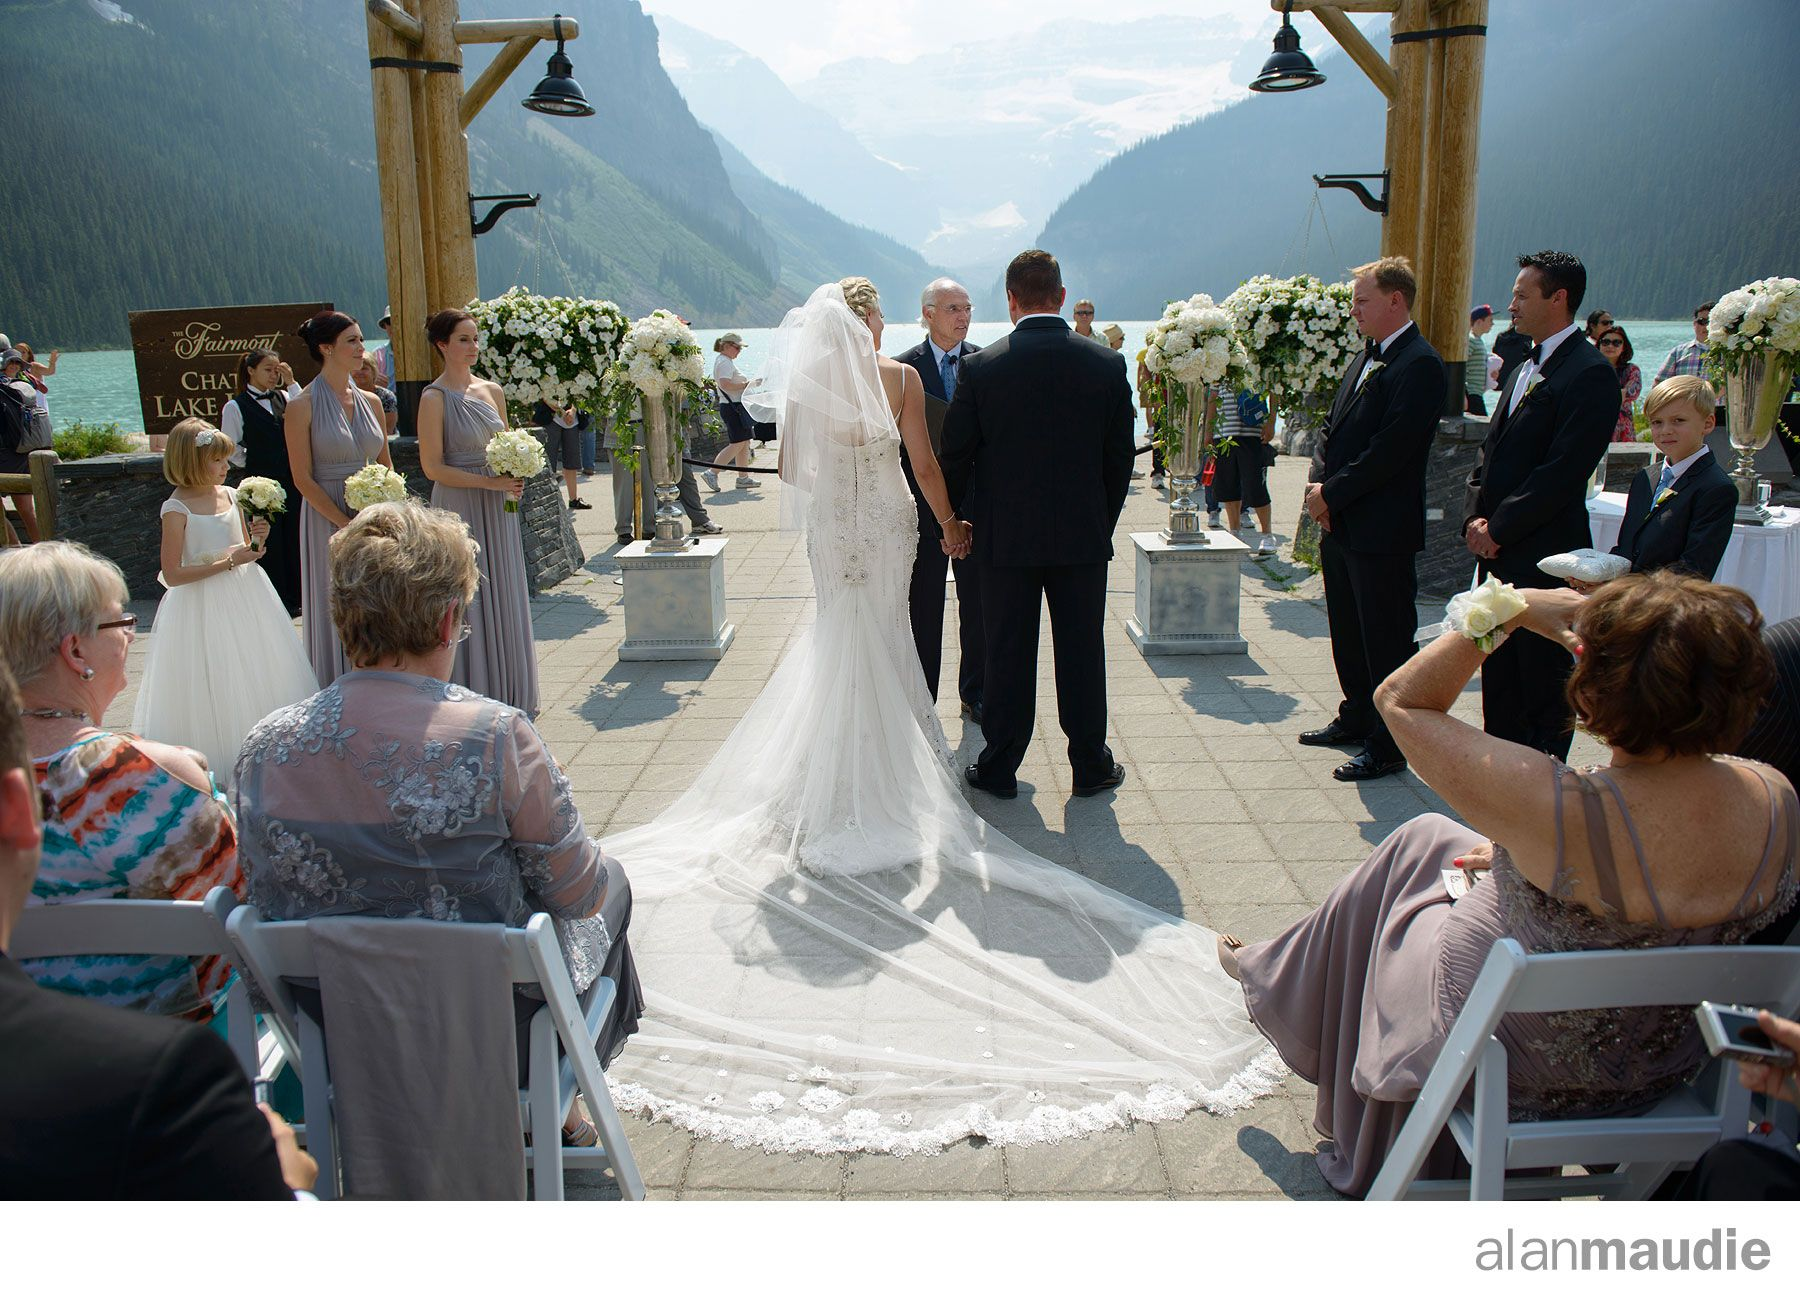 Cau Lake Louise Wedding Fairmont Victoria Terrace Rocky Mountain Weddings